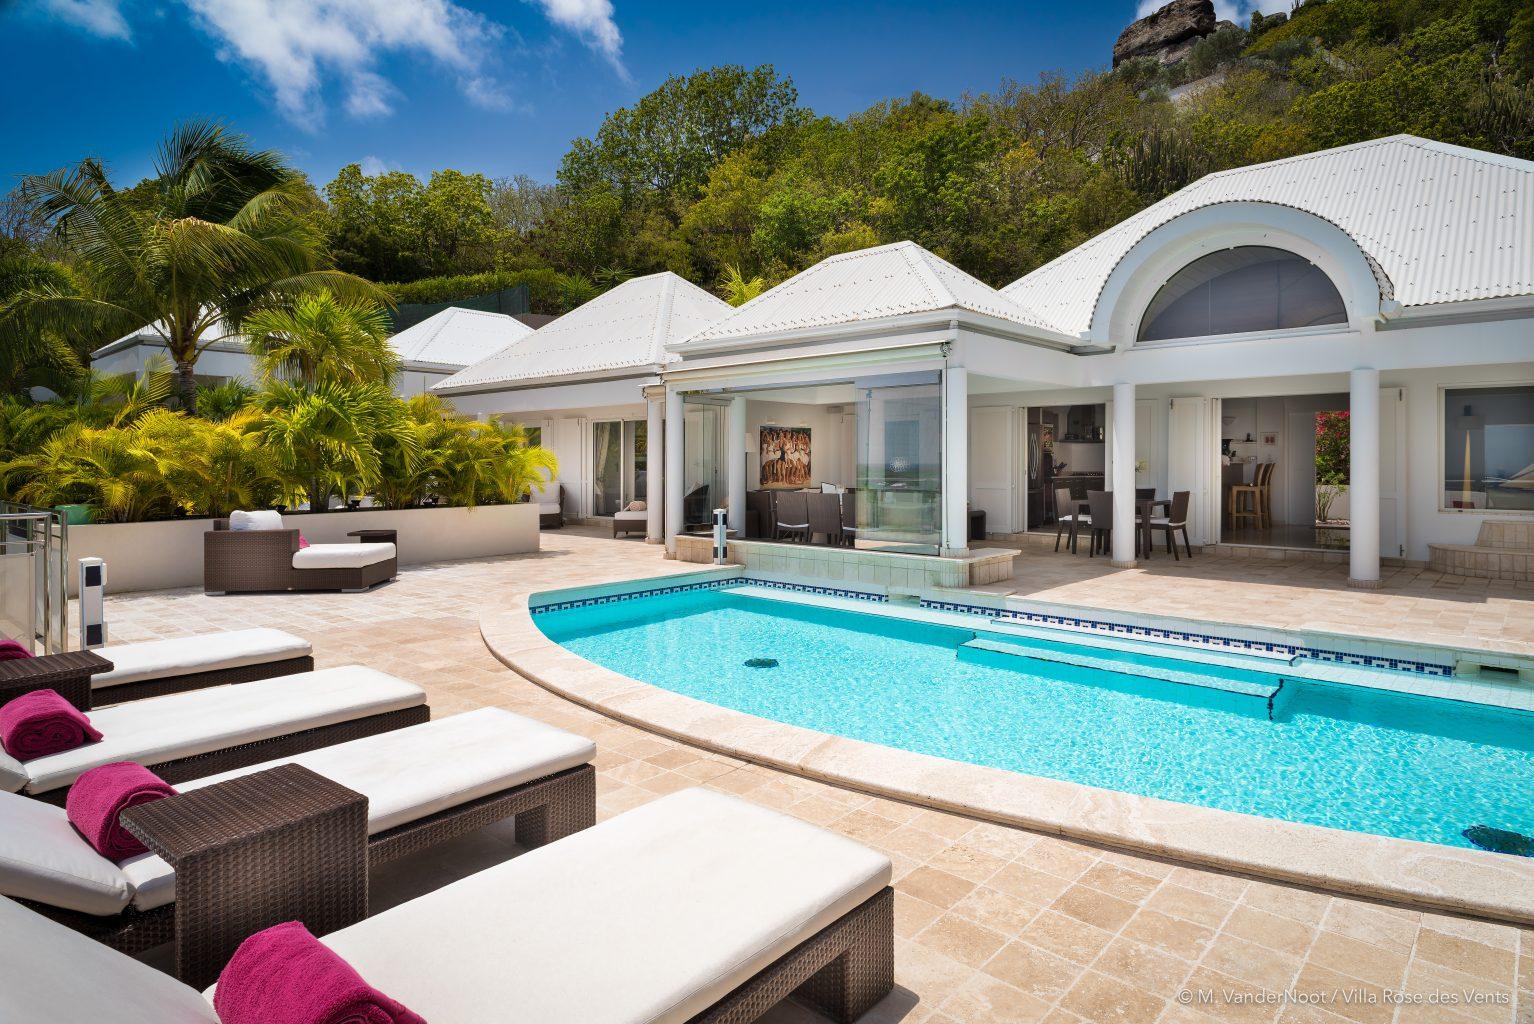 Villa Rose des Vents - Caribbean Villa Rental St Barth with Jacuzzi - Outside View